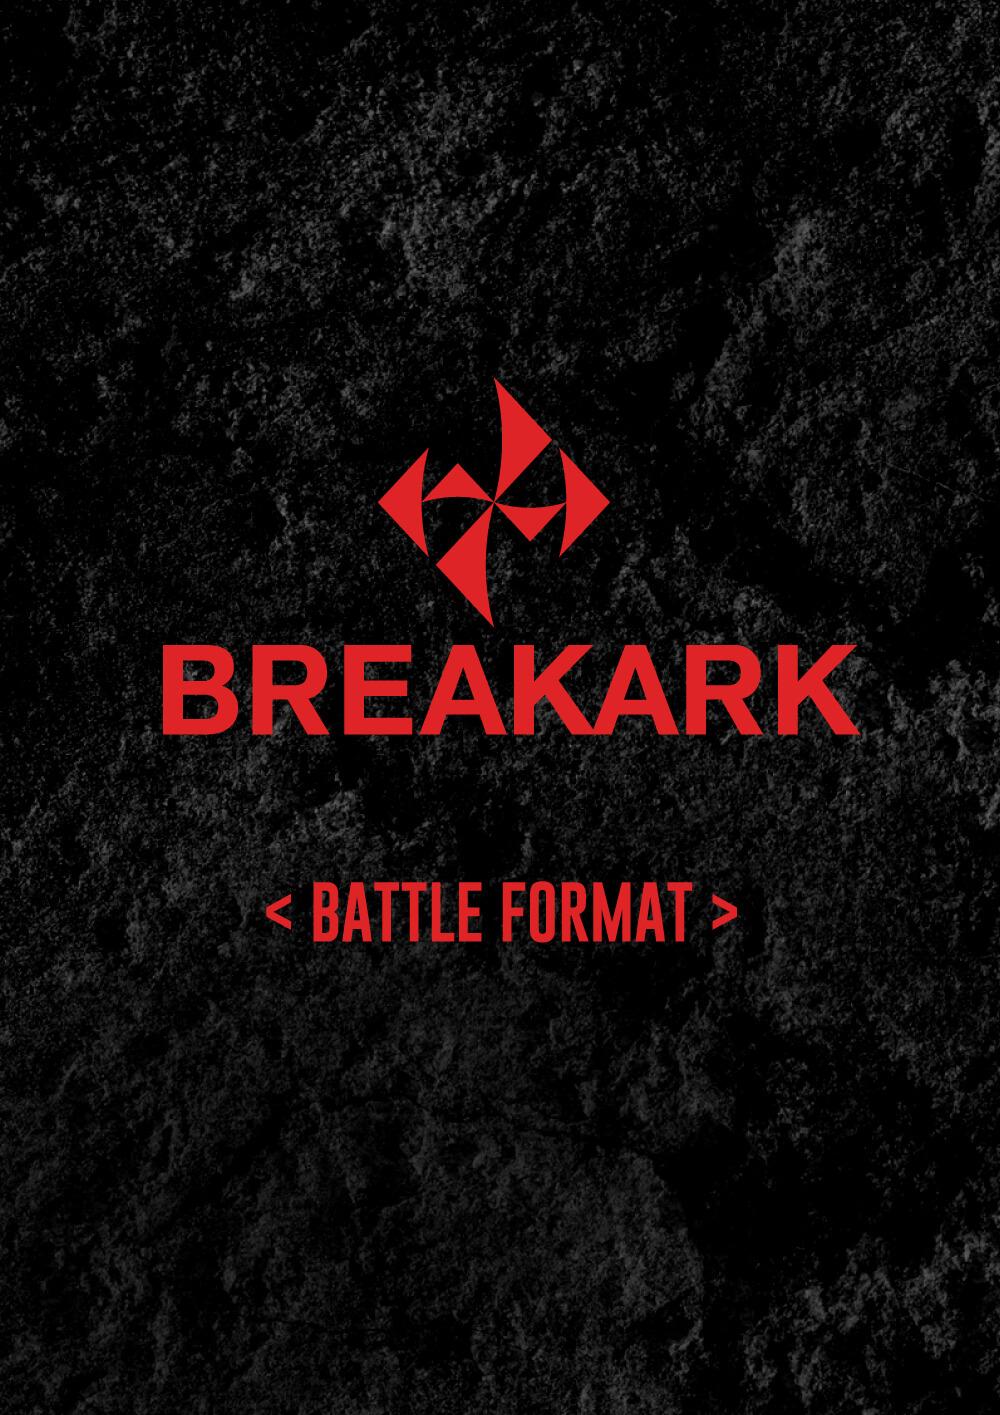 Battle Format